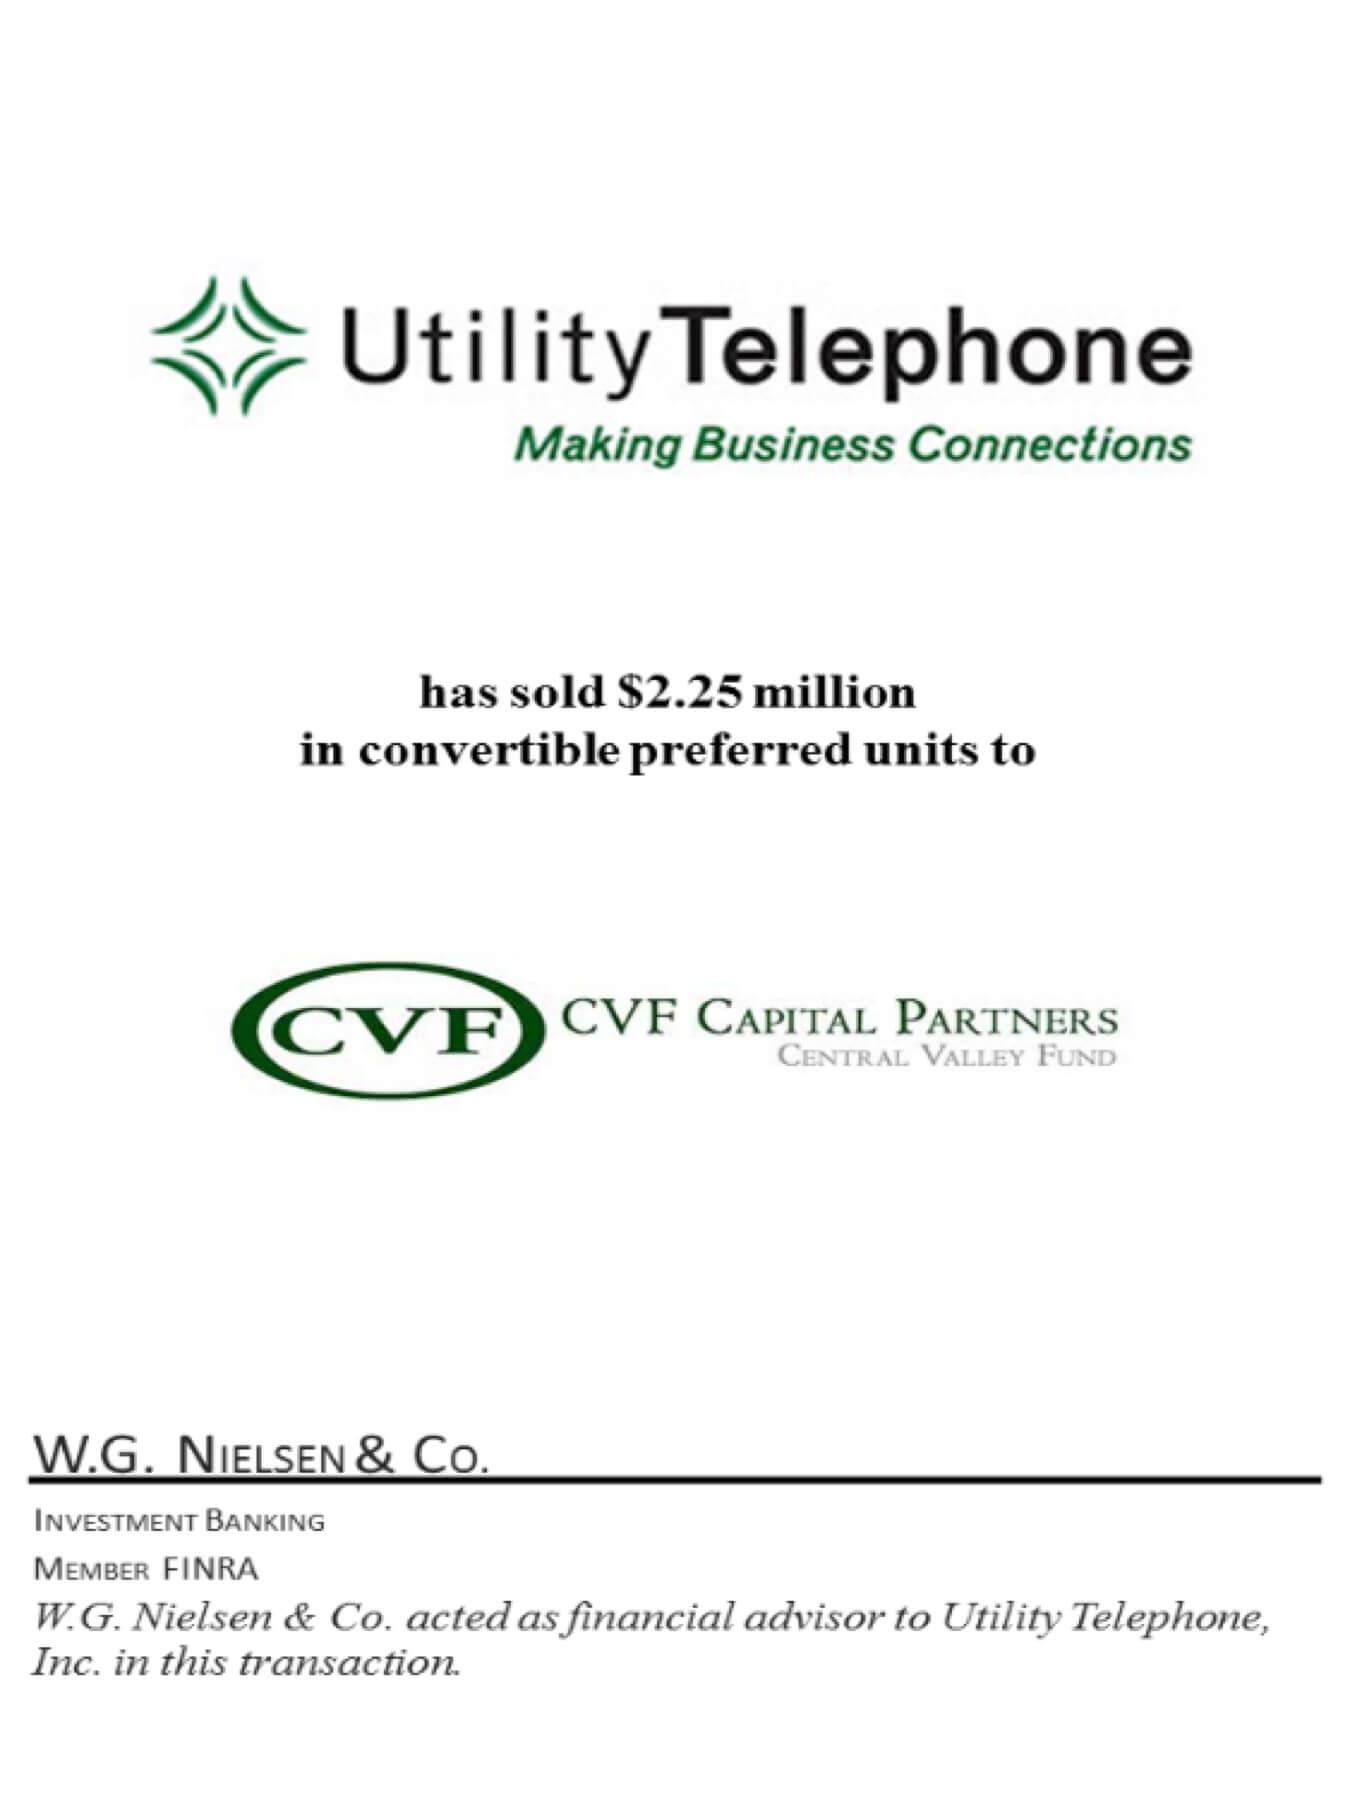 utility telephone 3 investment banking transaction